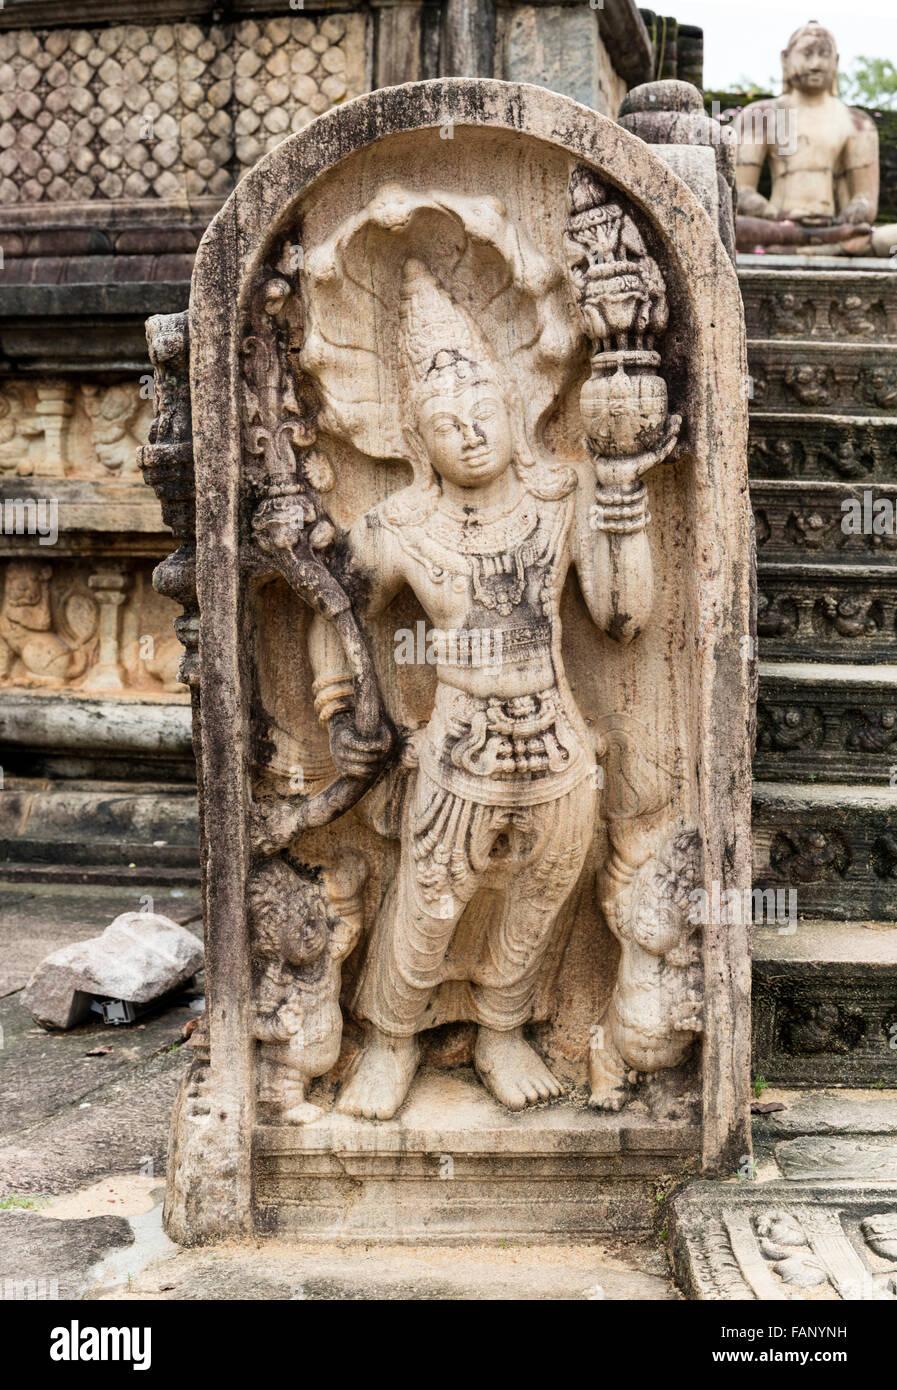 Secours Guardian, Vatadage, Polonnaruwa, Sri Lanka Photo Stock